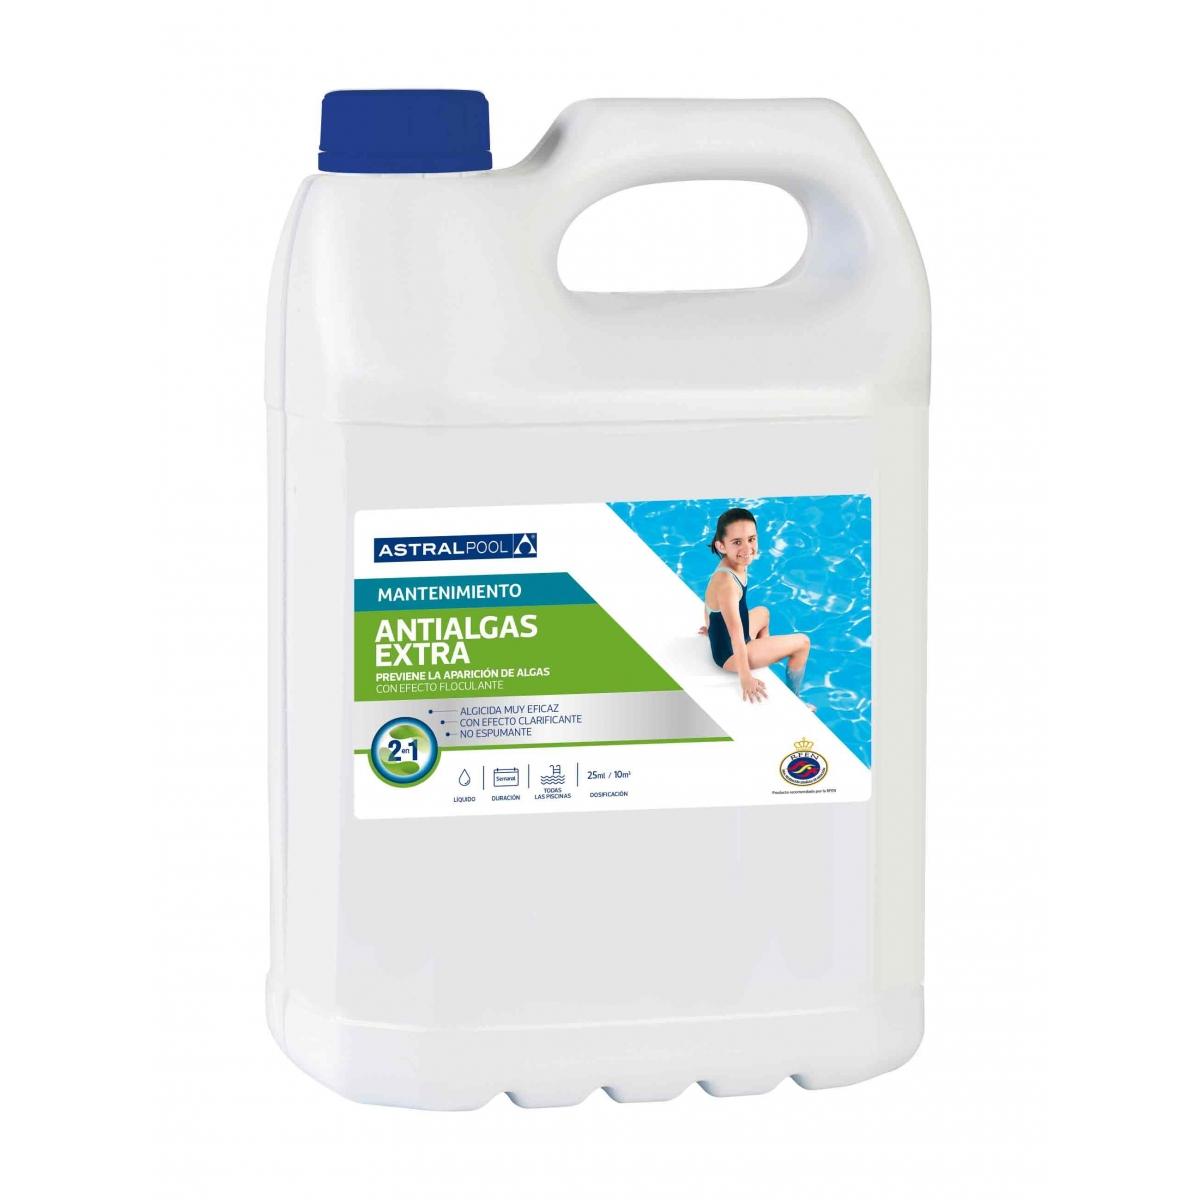 Antialgas Extra 5L (Compra mínima 20L)